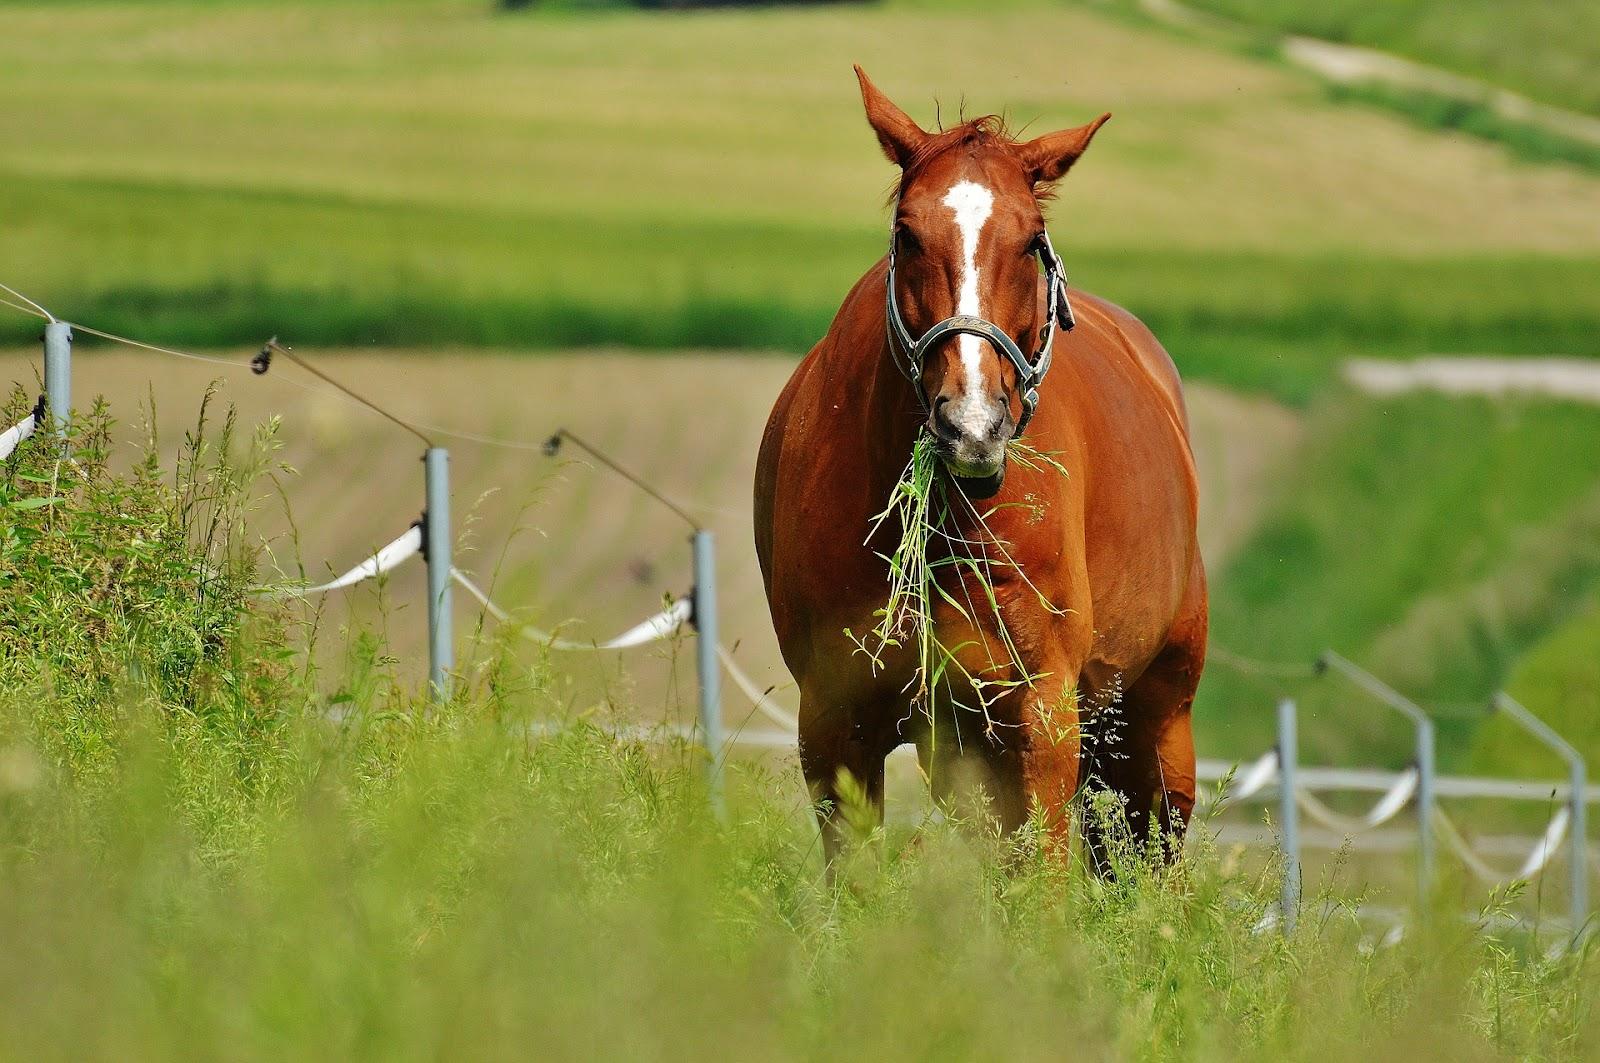 A chestnut horse grazes in a field